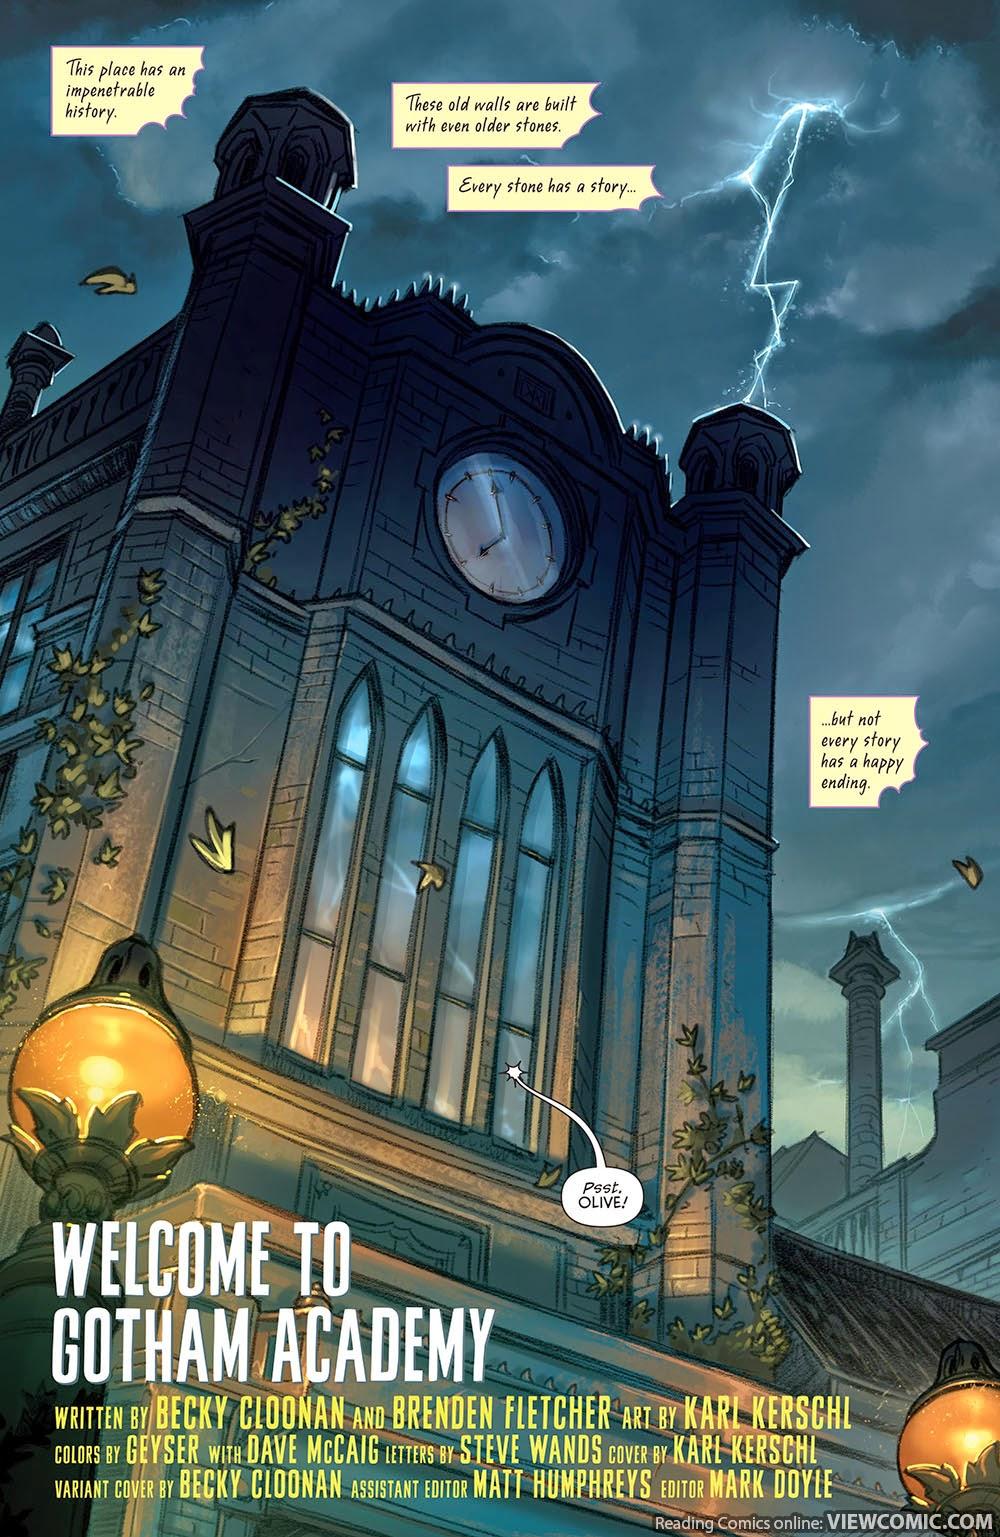 Gotham Academy 001 (2014) ……………………